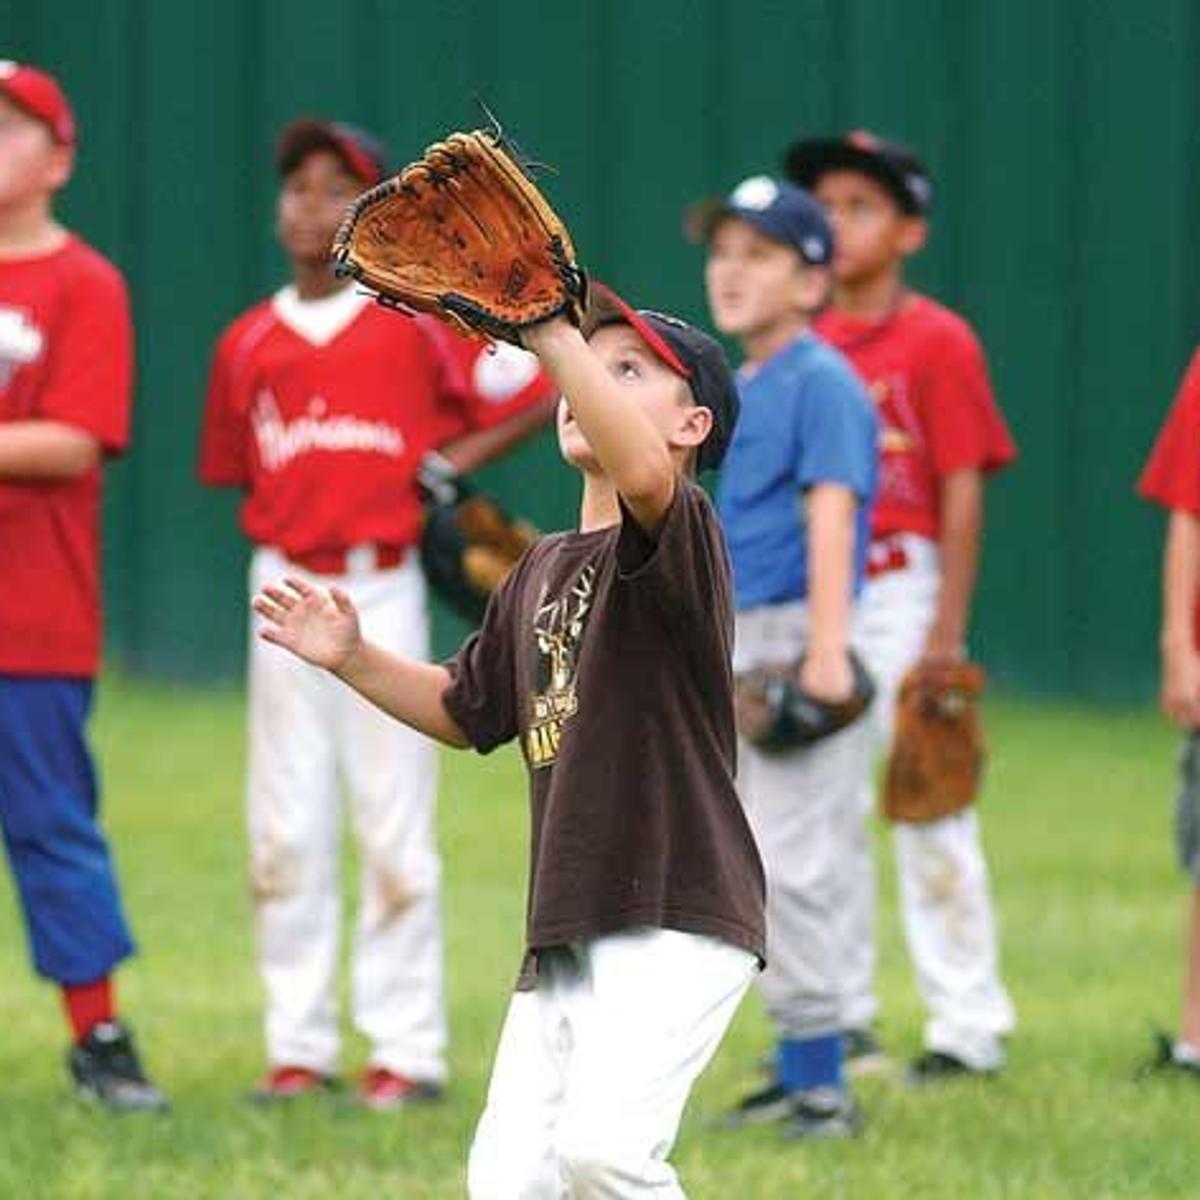 Youth baseball, softball leagues gearing up for 2015 season | News